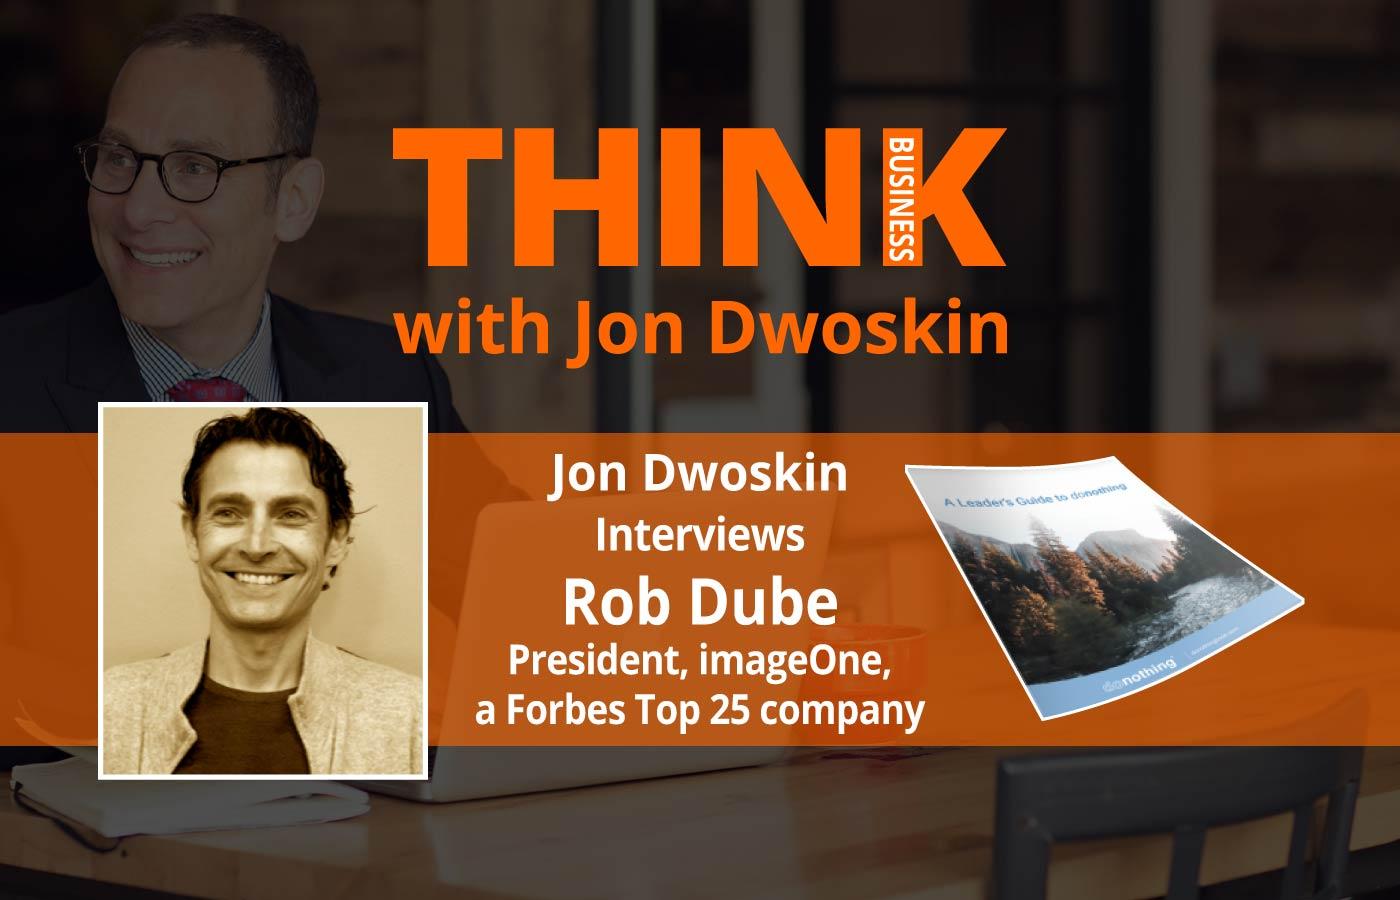 THINK Business: Jon Dwoskin Interviews Rob Dube